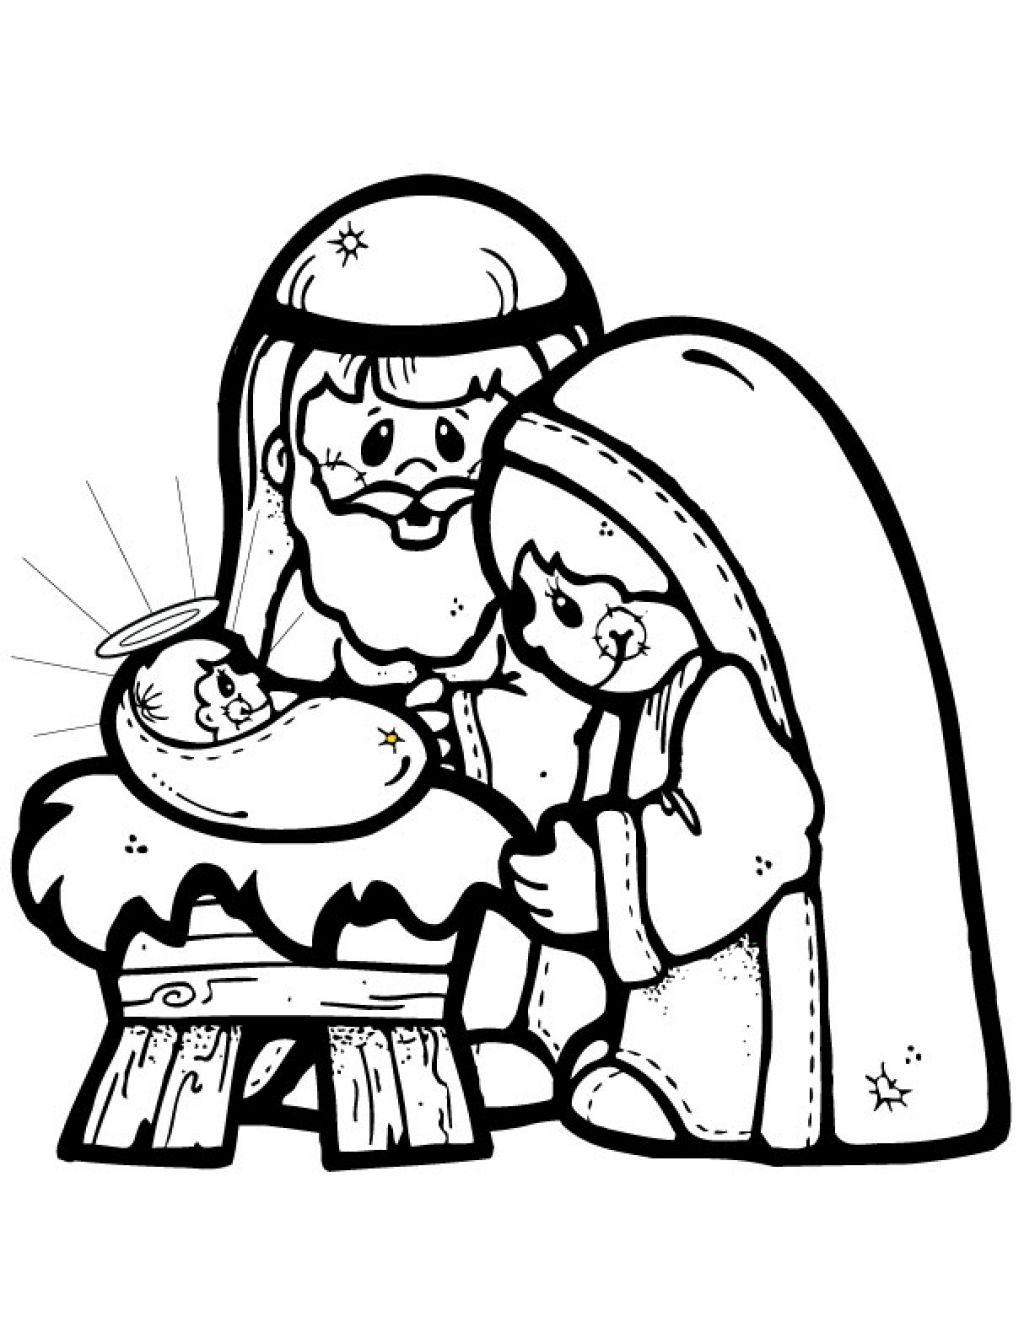 Free Nativity Black Cliparts, Download Free Clip Art, Free ...